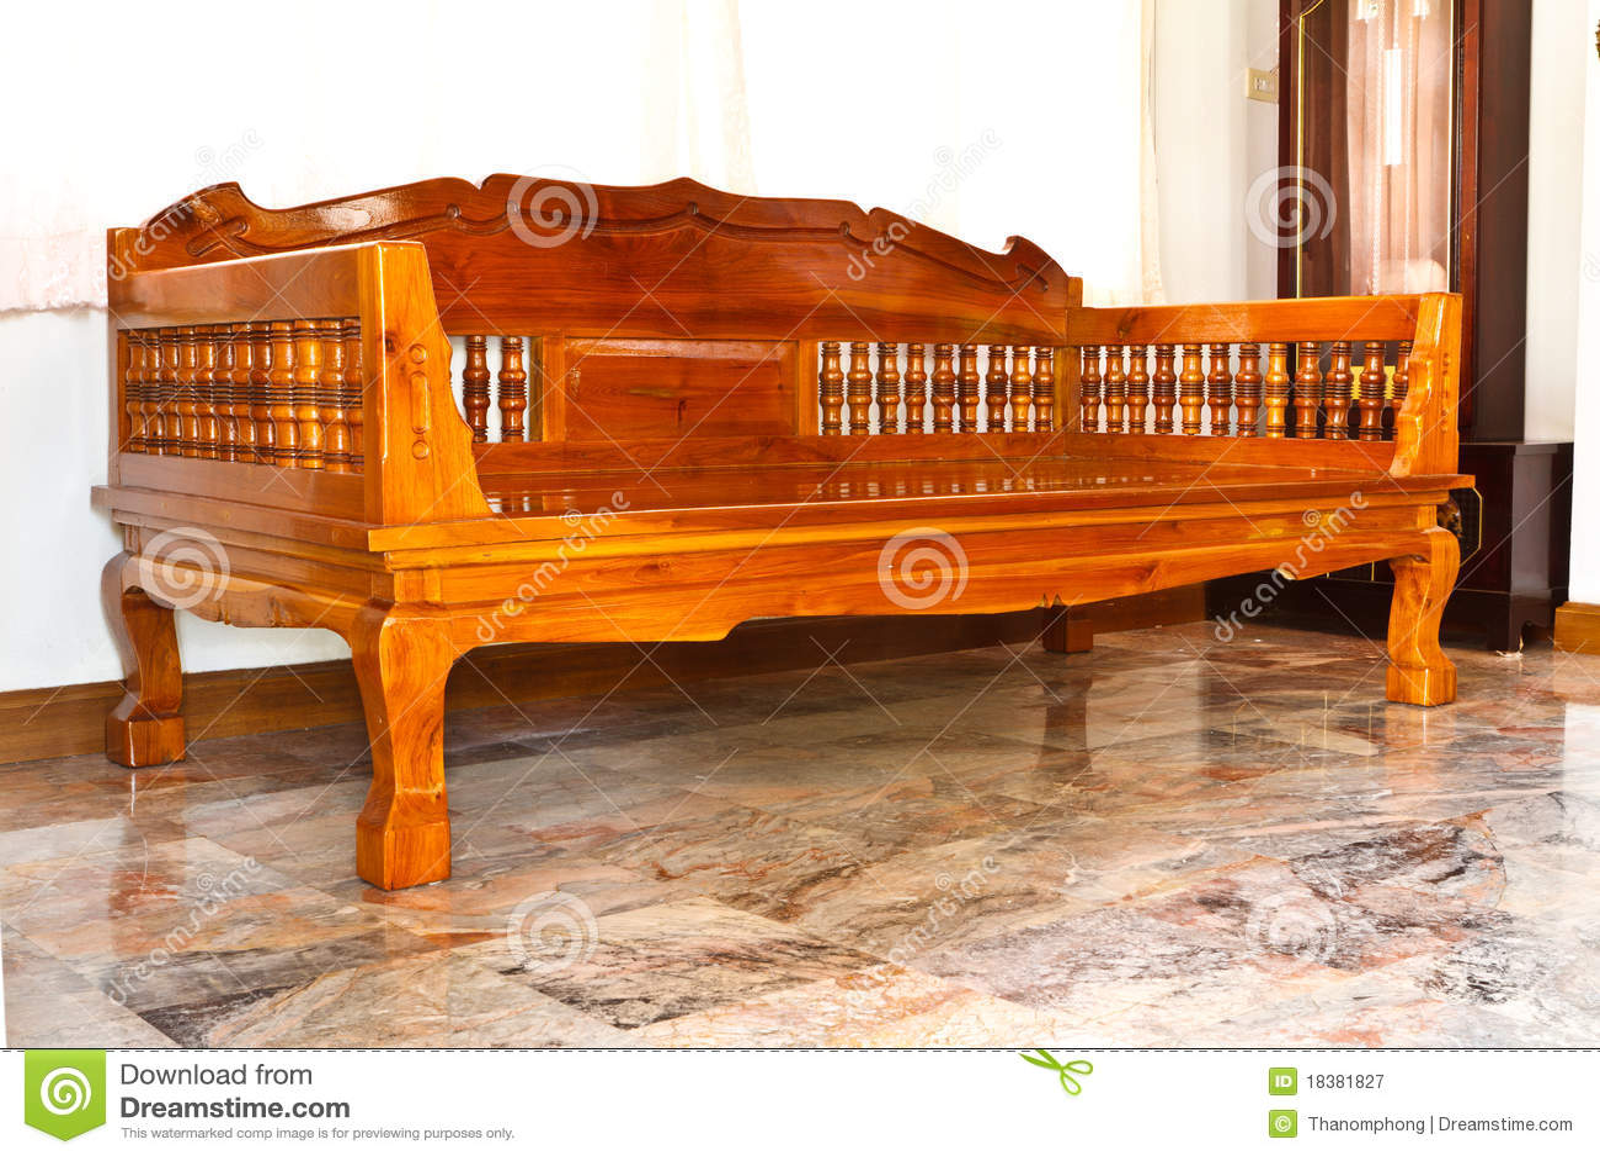 Muebles modernos de madera imagen de archivo imagen de for Diseno de muebles de madera modernos